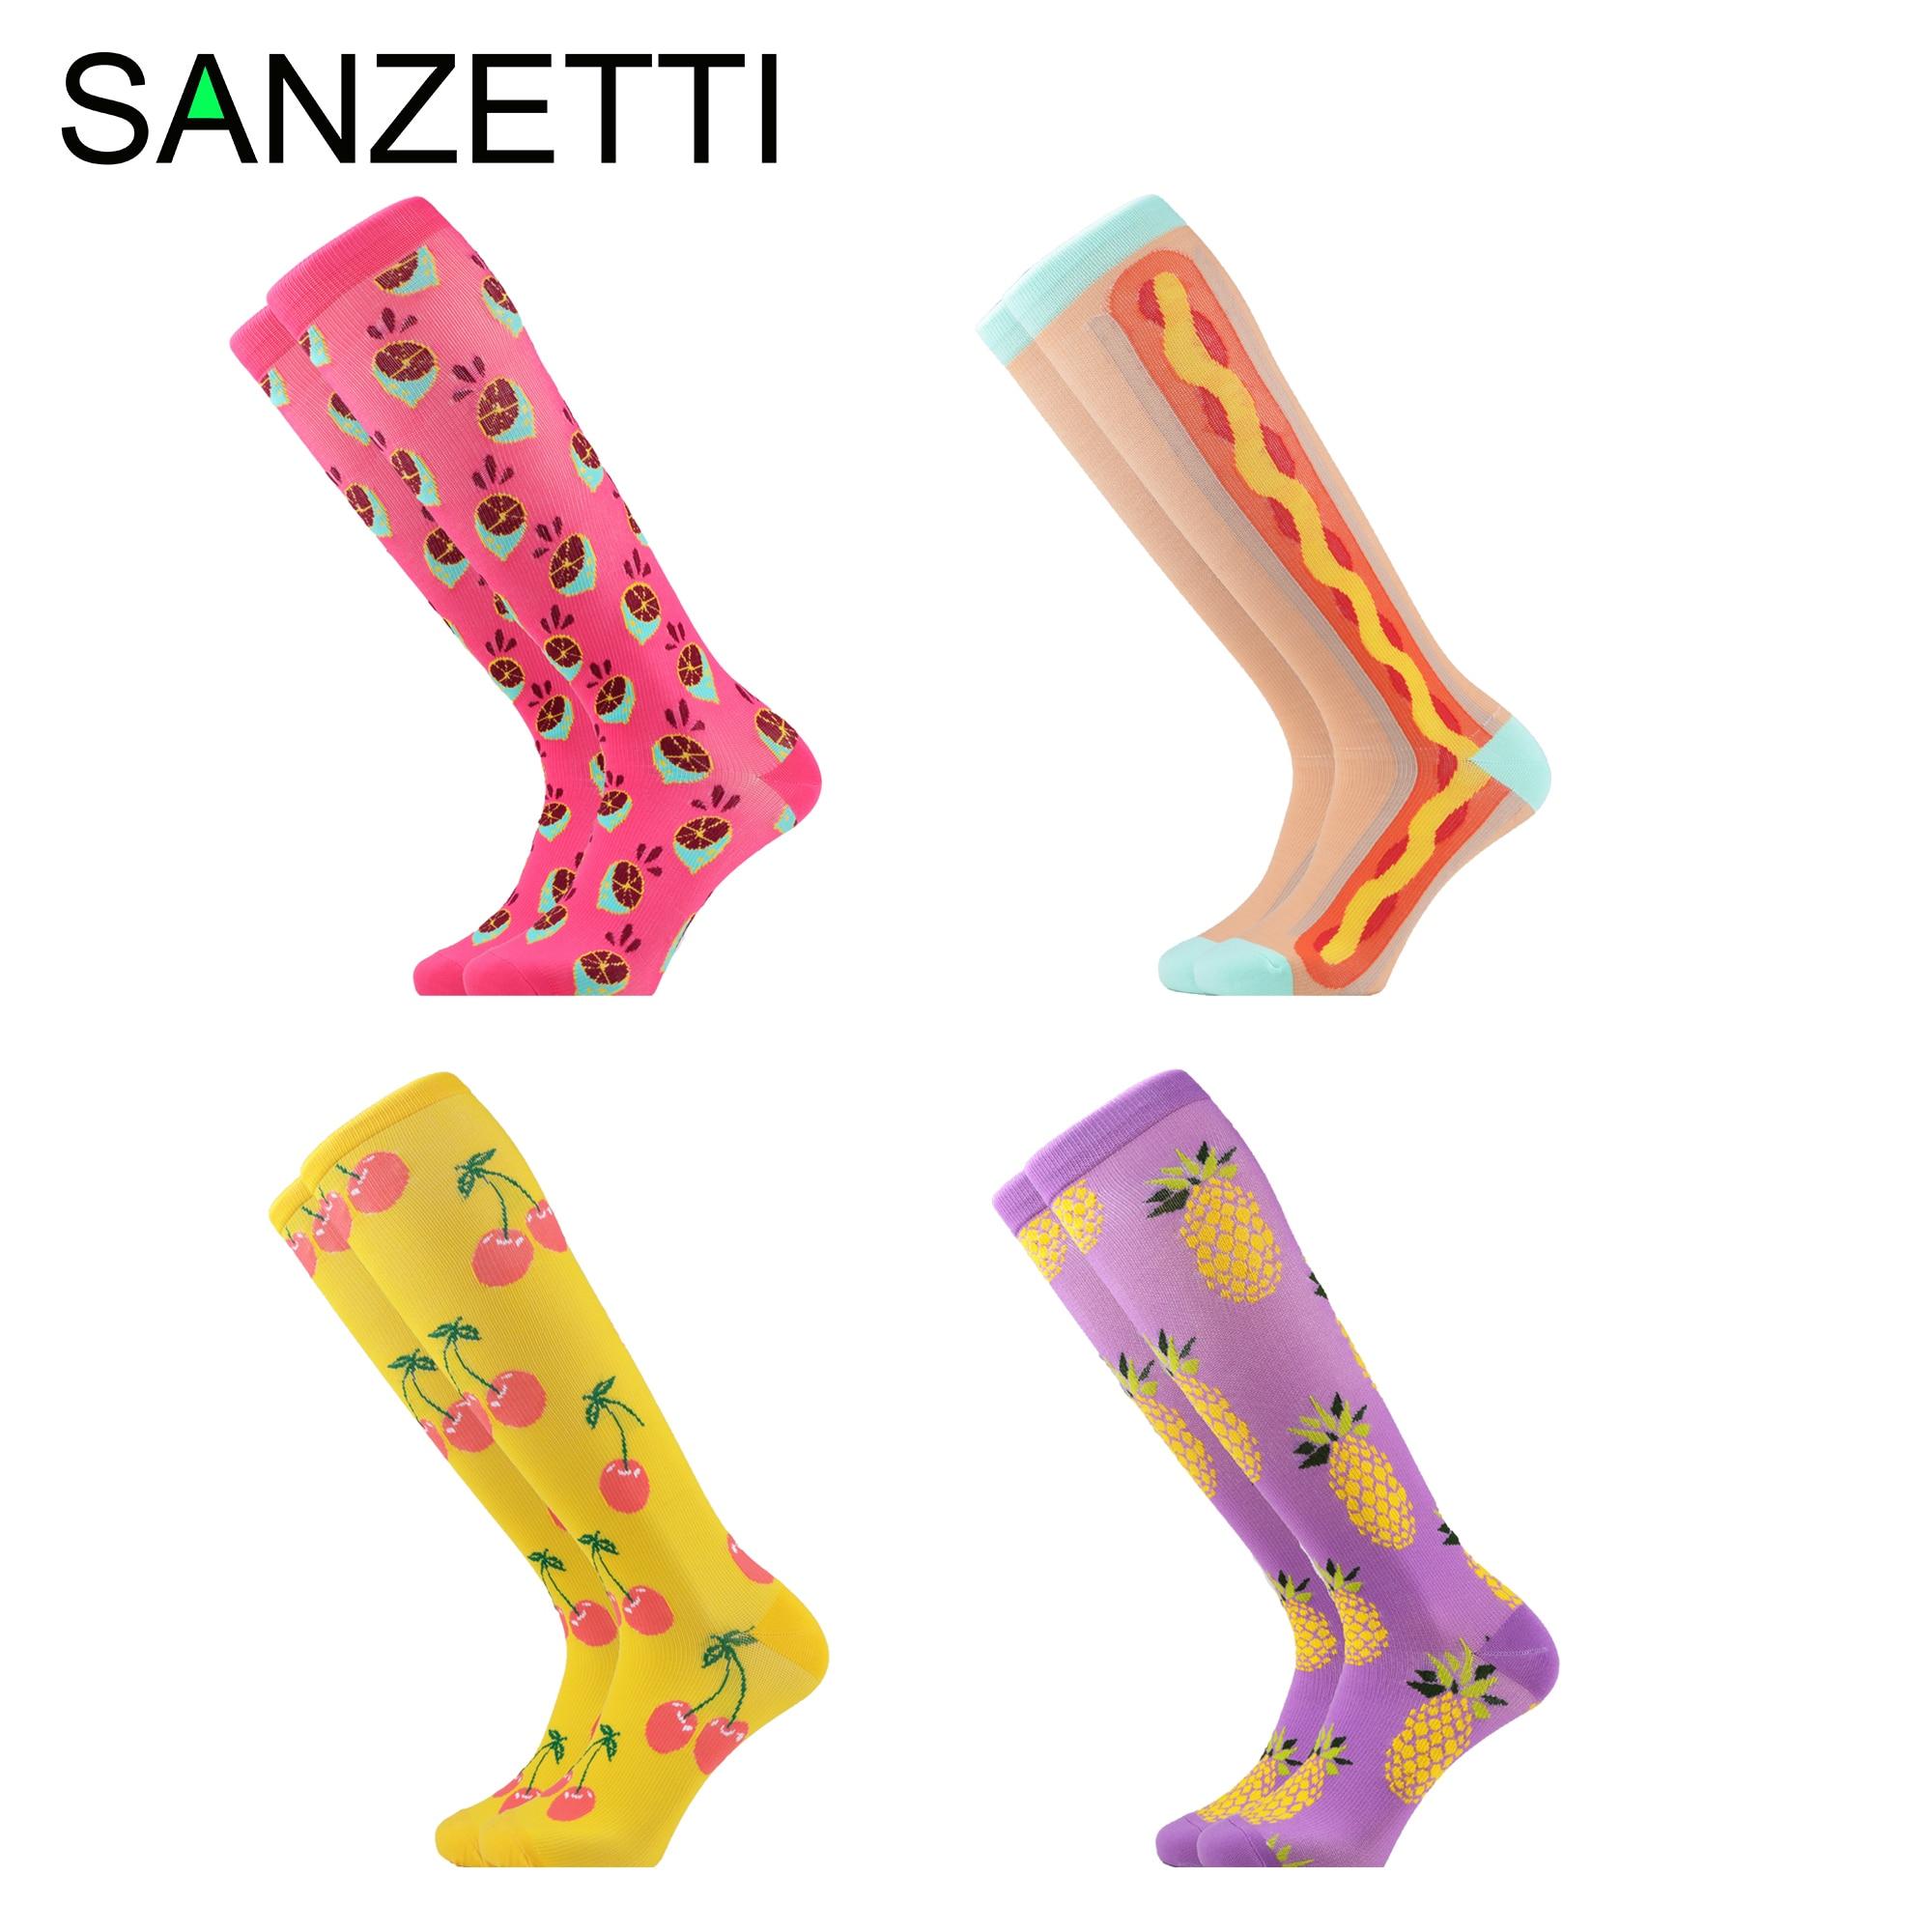 SANZETTI 4 Pairs/Lot Women  Patchwork Fruit  Combed Cotton Compression Socks Party Below Knee Plaid Anti-Fatigue Long Fun Socks